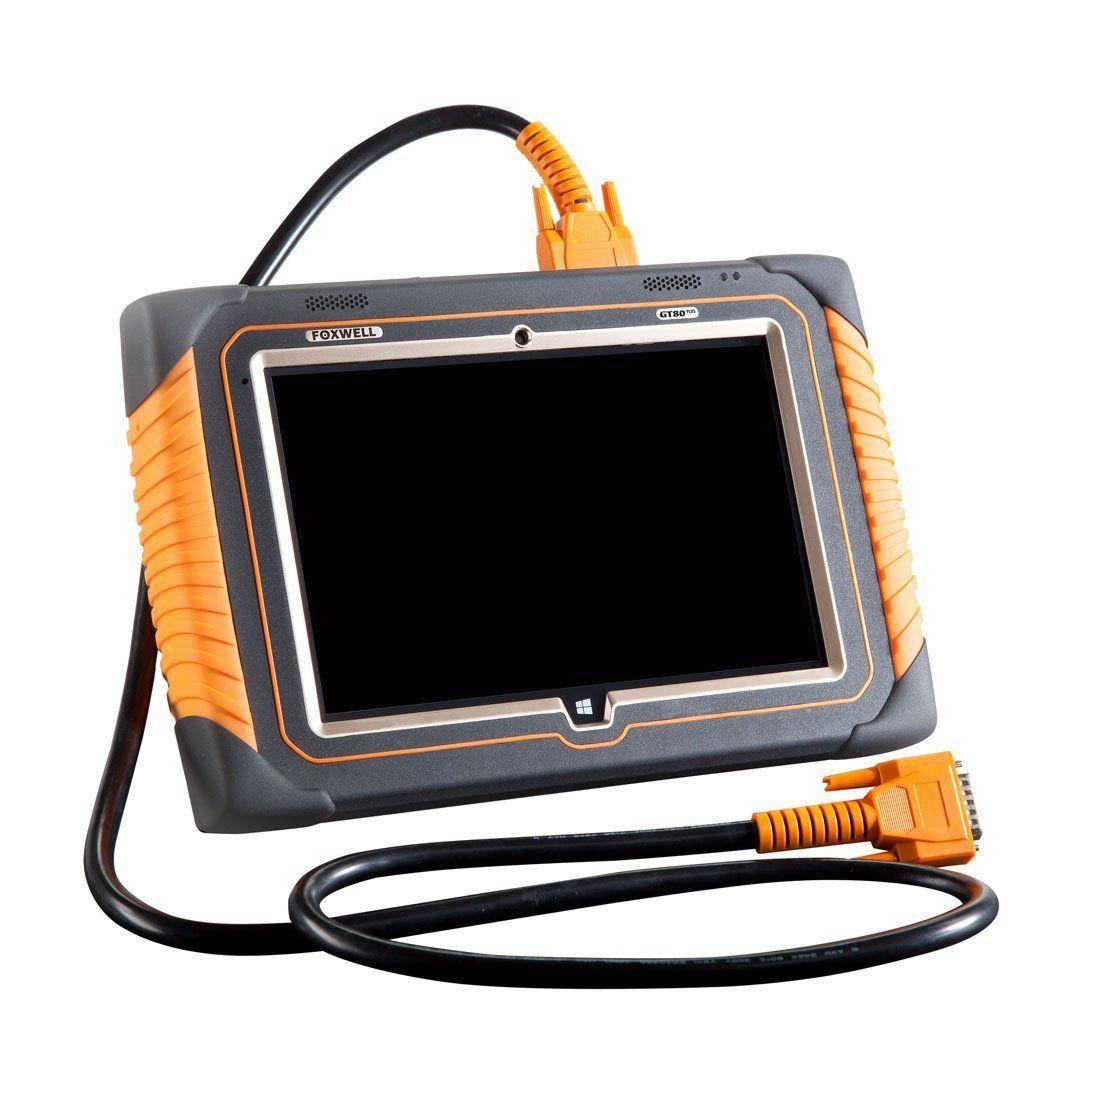 foxwell gt80 plus obd2 diagnostic analysis system auto car code scanner reprogramm. Black Bedroom Furniture Sets. Home Design Ideas